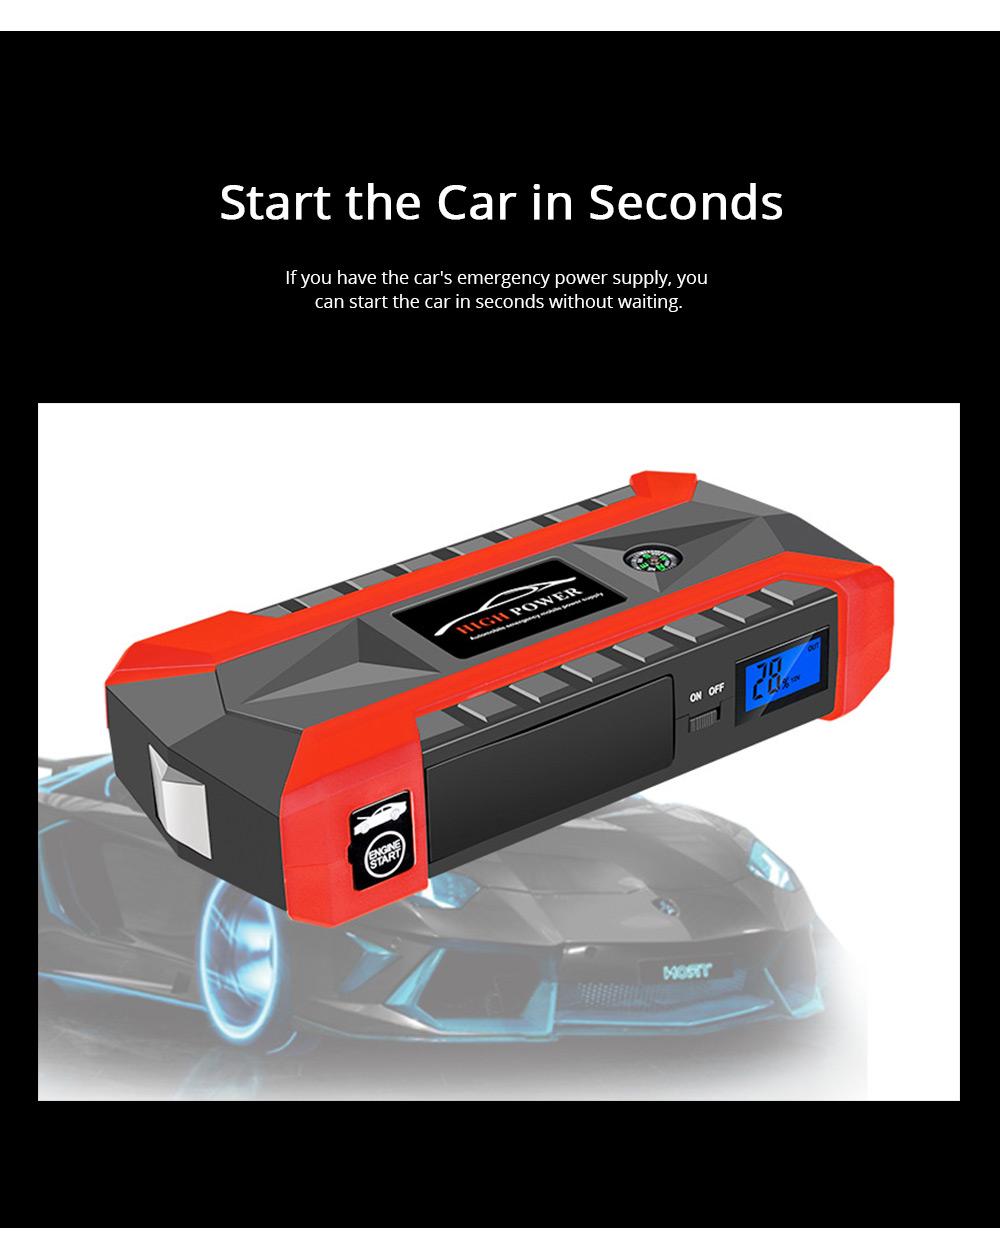 Automobile Emergency Starting Power Supply Automobile Diesel Gasoline Dual Start Standby Power Supply 2